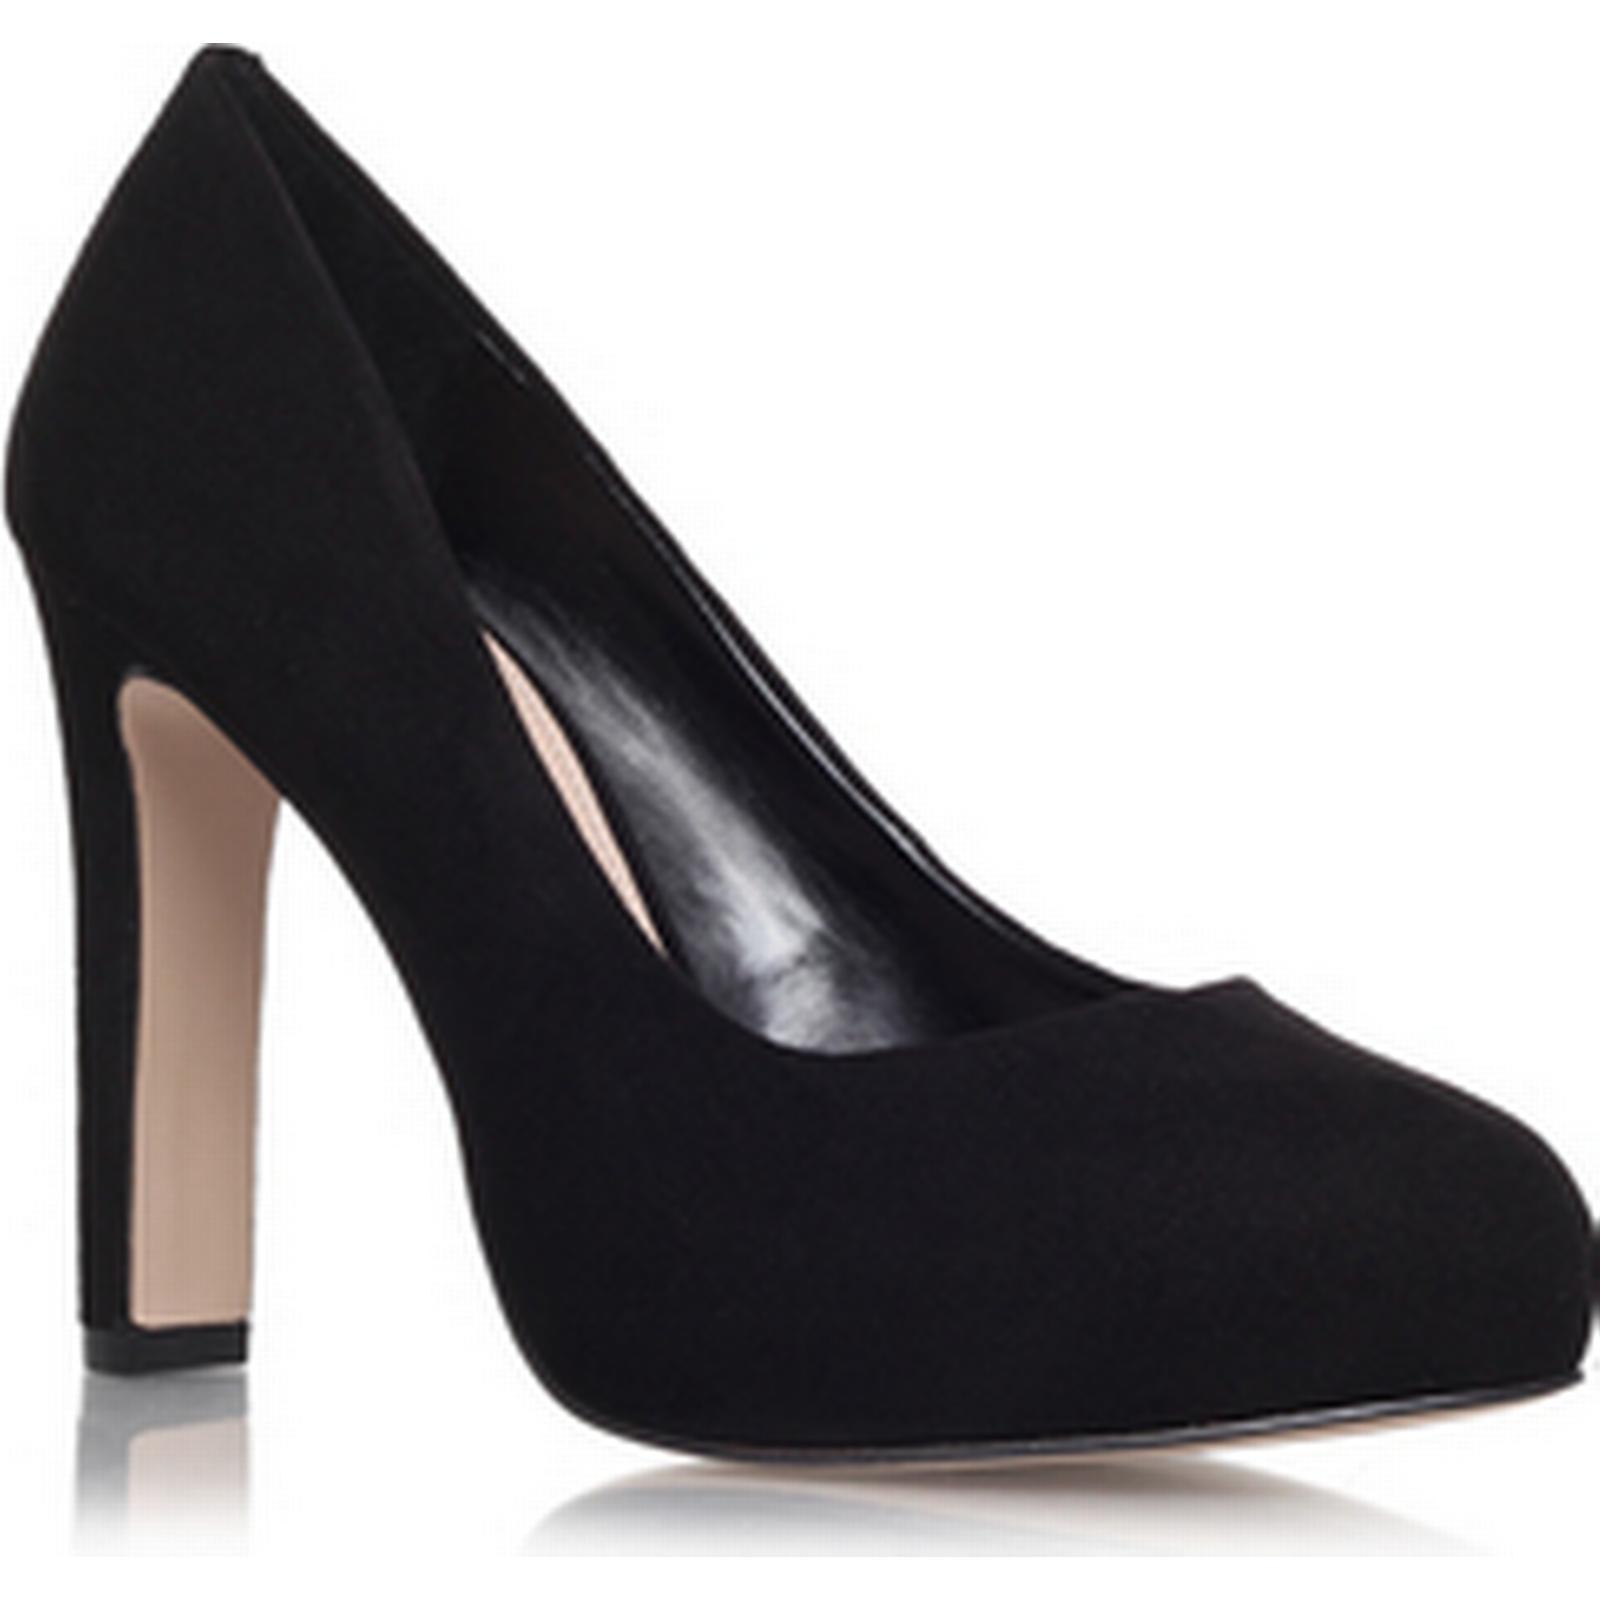 Gentleman/Lady - CARVELA AWARE AWARE CARVELA - elegance 995976